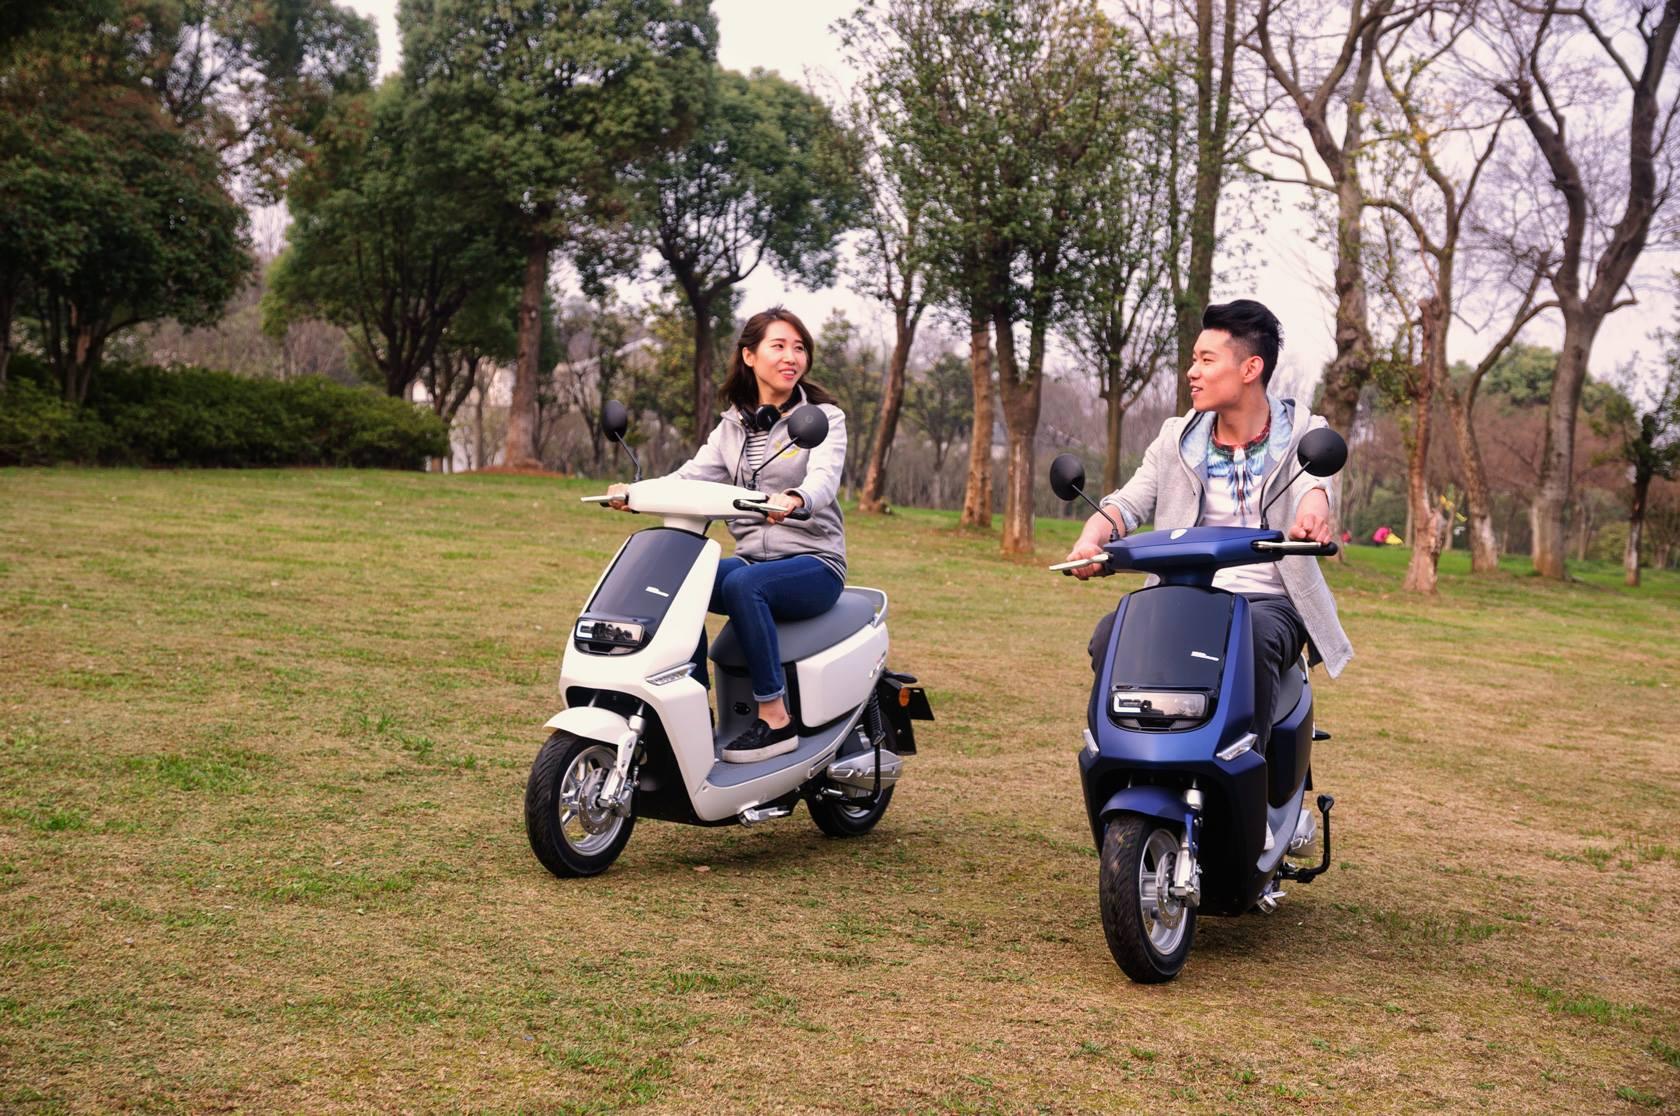 ЭЛЕКТРОСКУТЕР YADEA C-LINE ( Li-ion )  Артмото - купить квадроцикл в украине и харькове, мотоцикл, снегоход, скутер, мопед, электромобиль